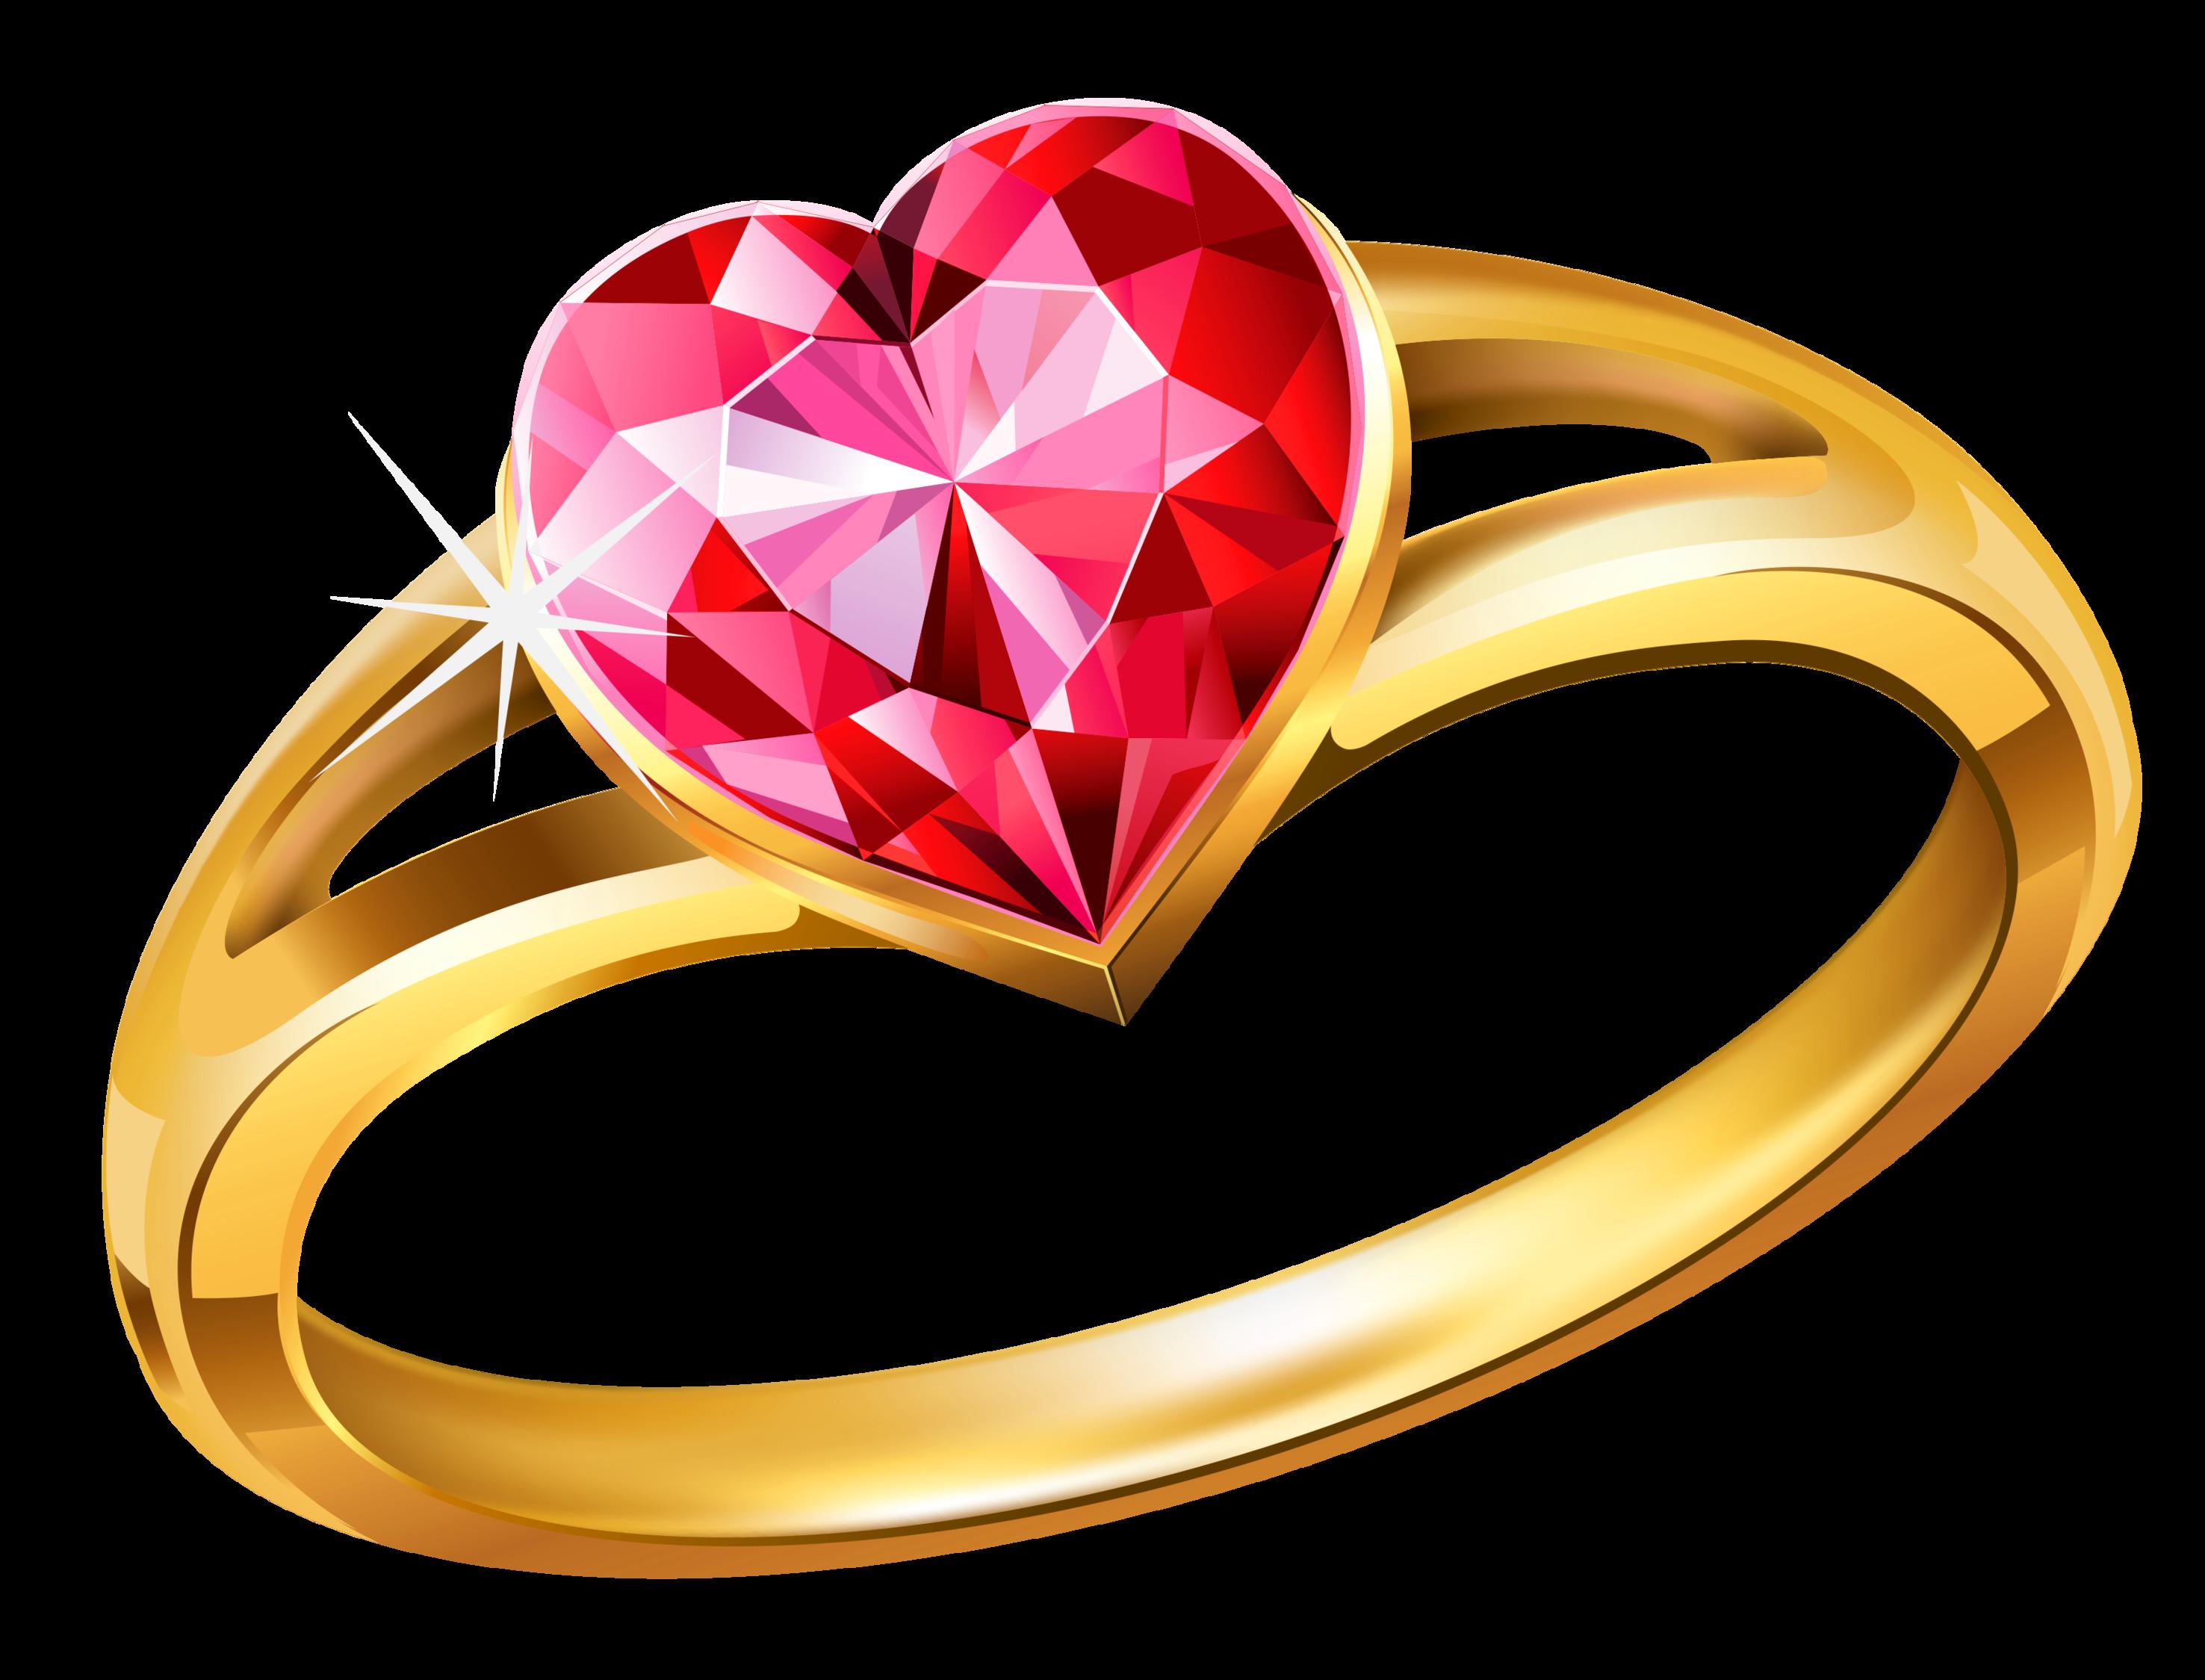 2952x2249 Diamond Ring Clipart Kavalabeauty